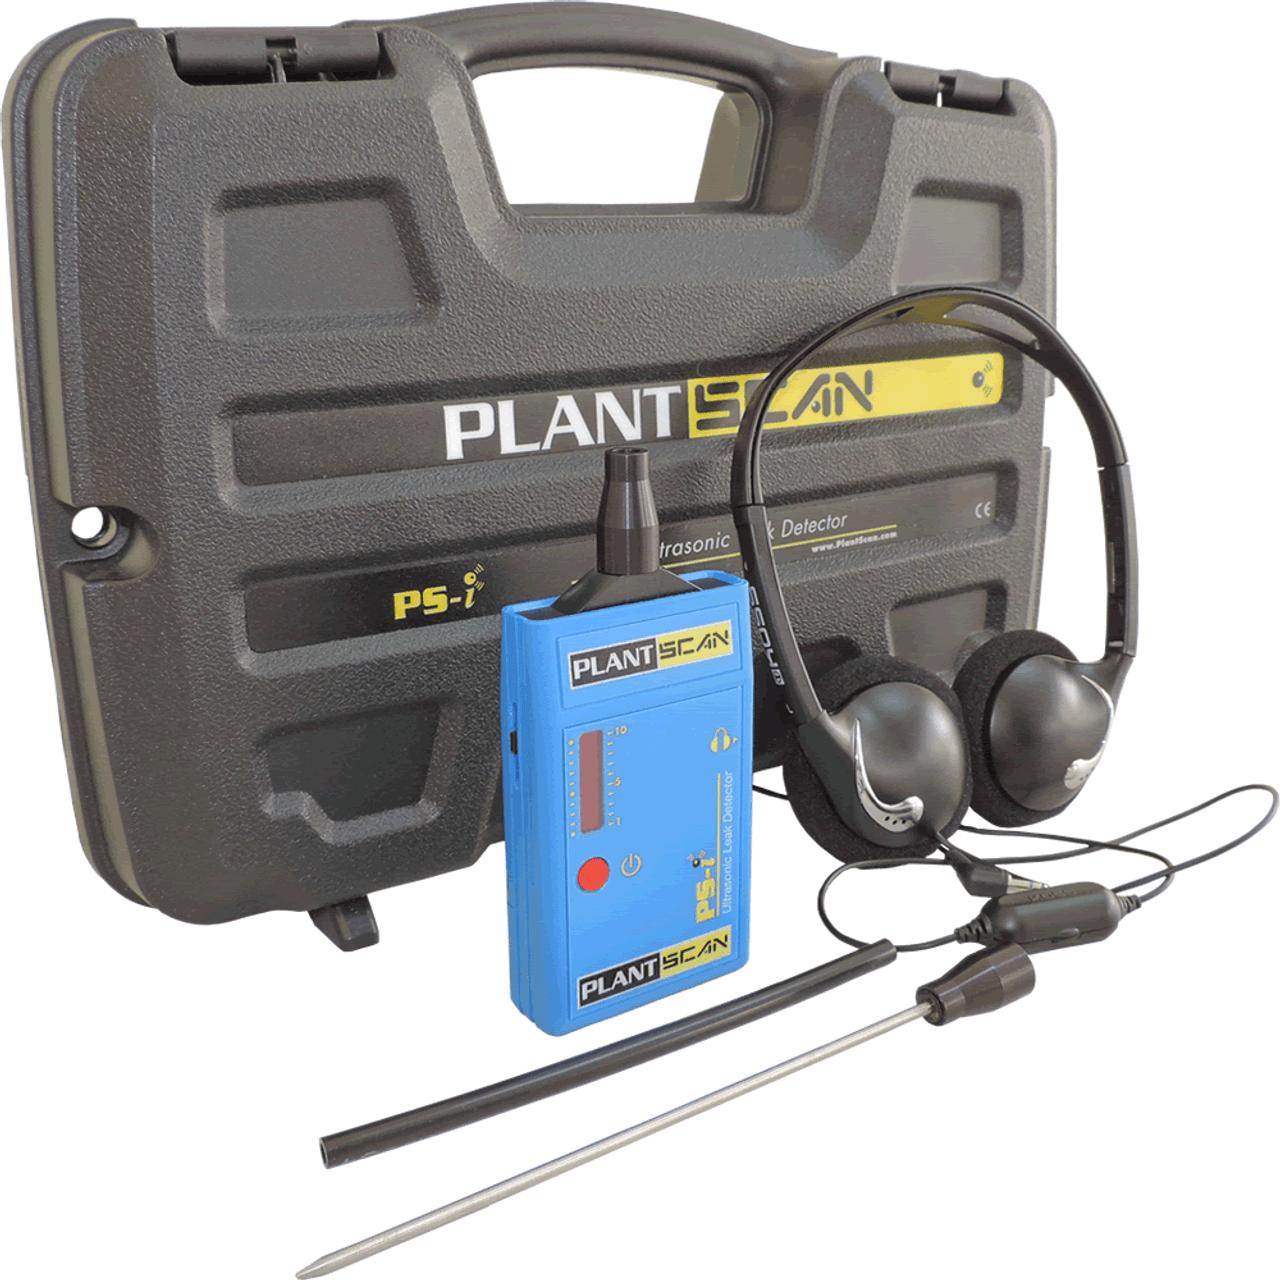 Ps-i Kit - Ultrasonic Leak Detector Side View